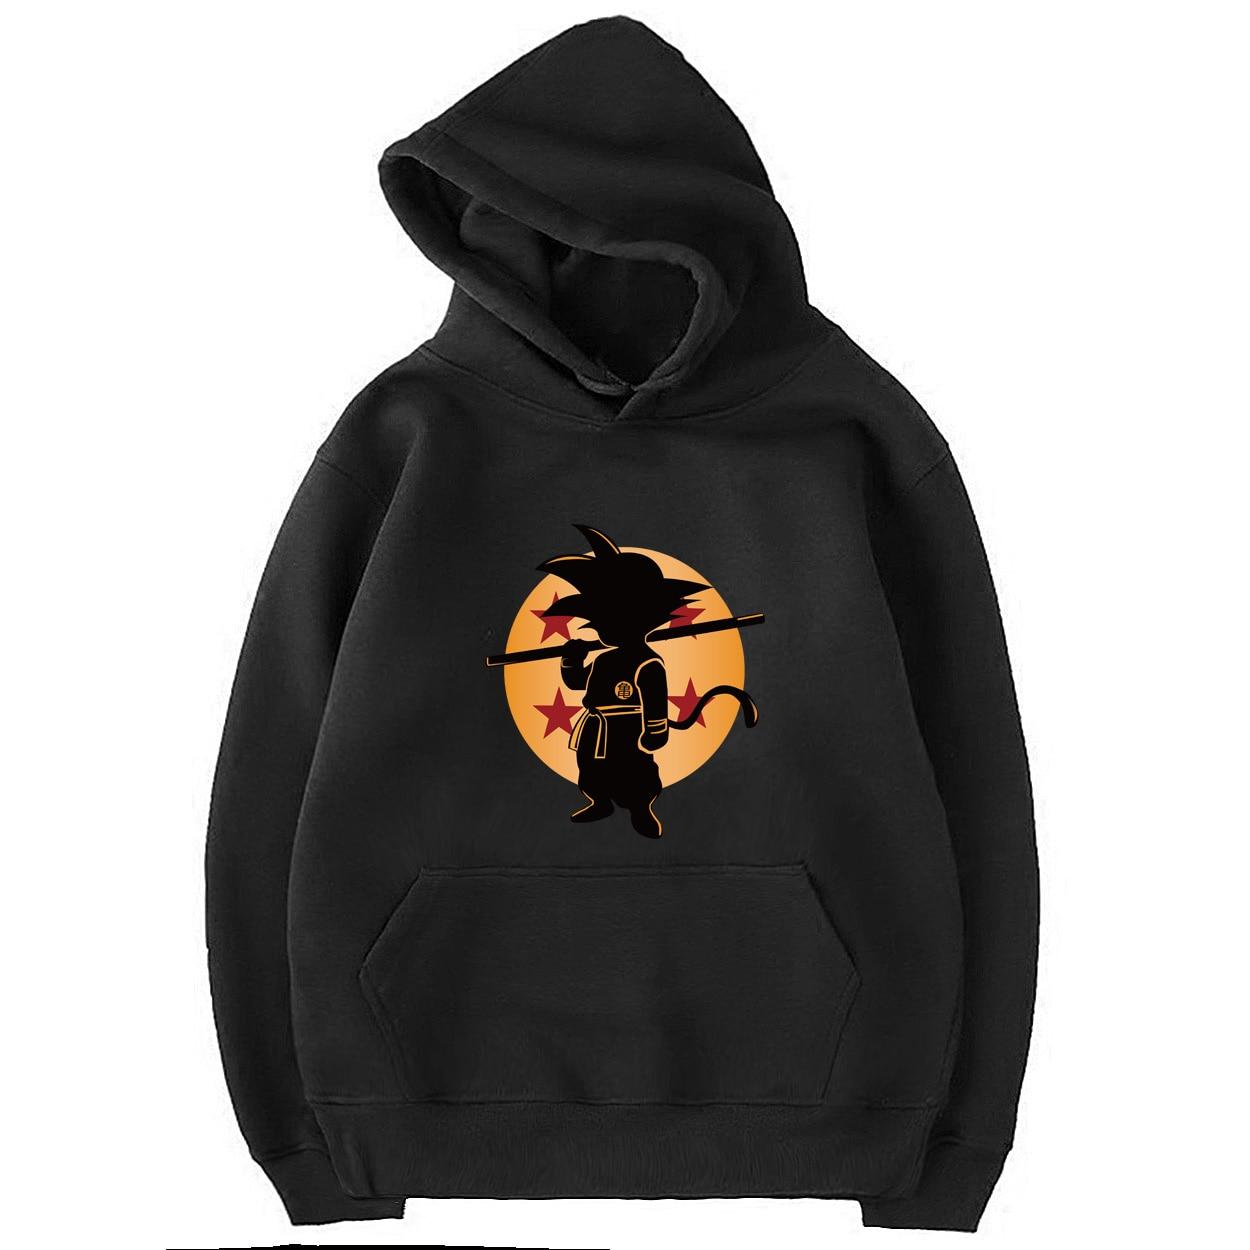 autumn winter long Sleeve pullovers Men Dragon Ball Z high quality hoodies for Man Cartoon hipster fitness sweatshirt 2019 S-XXL